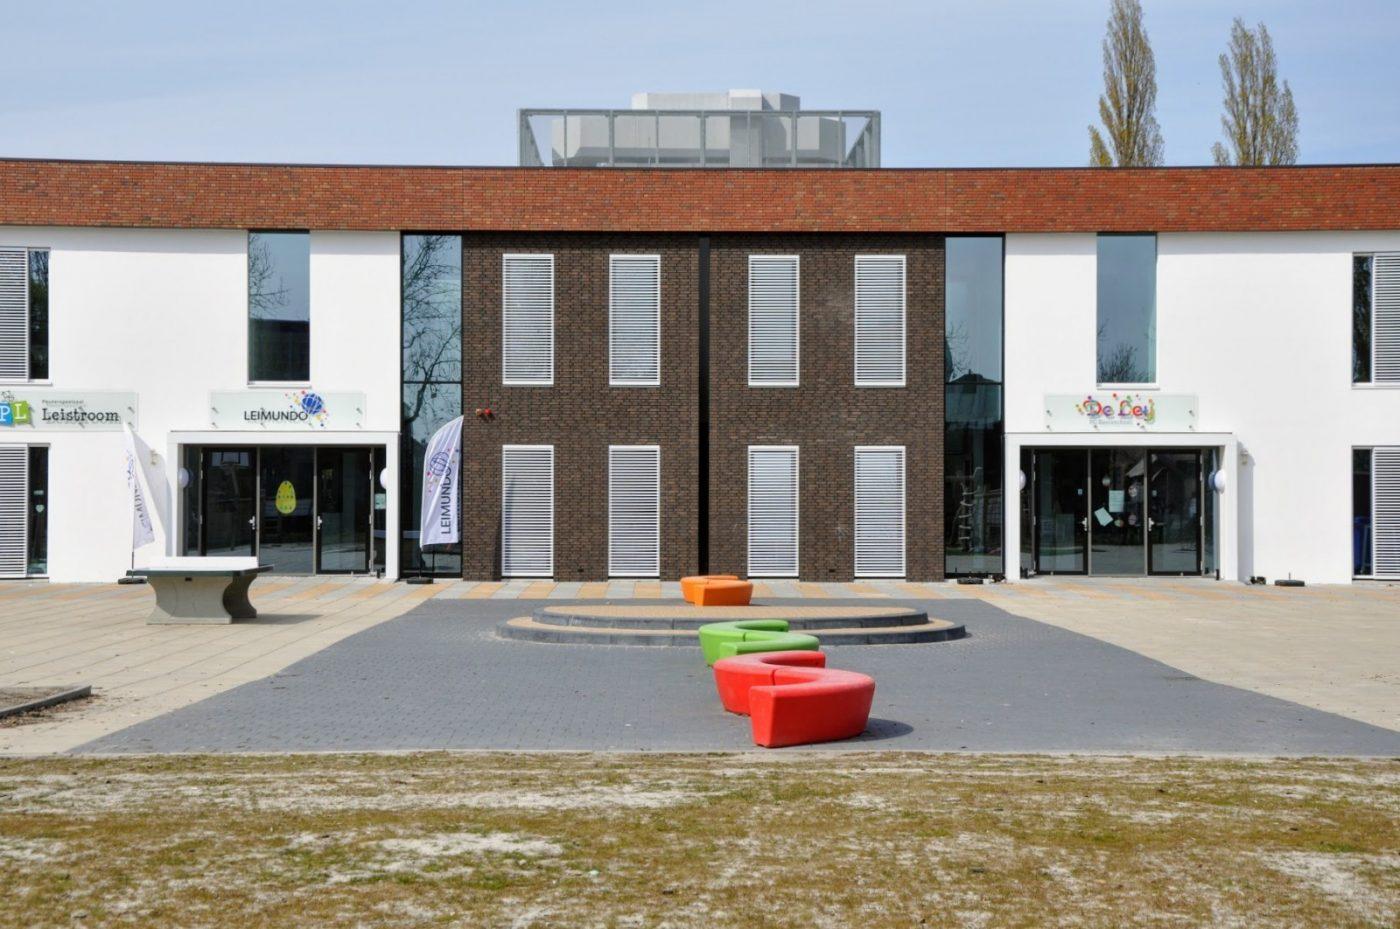 Basisschool De Ley